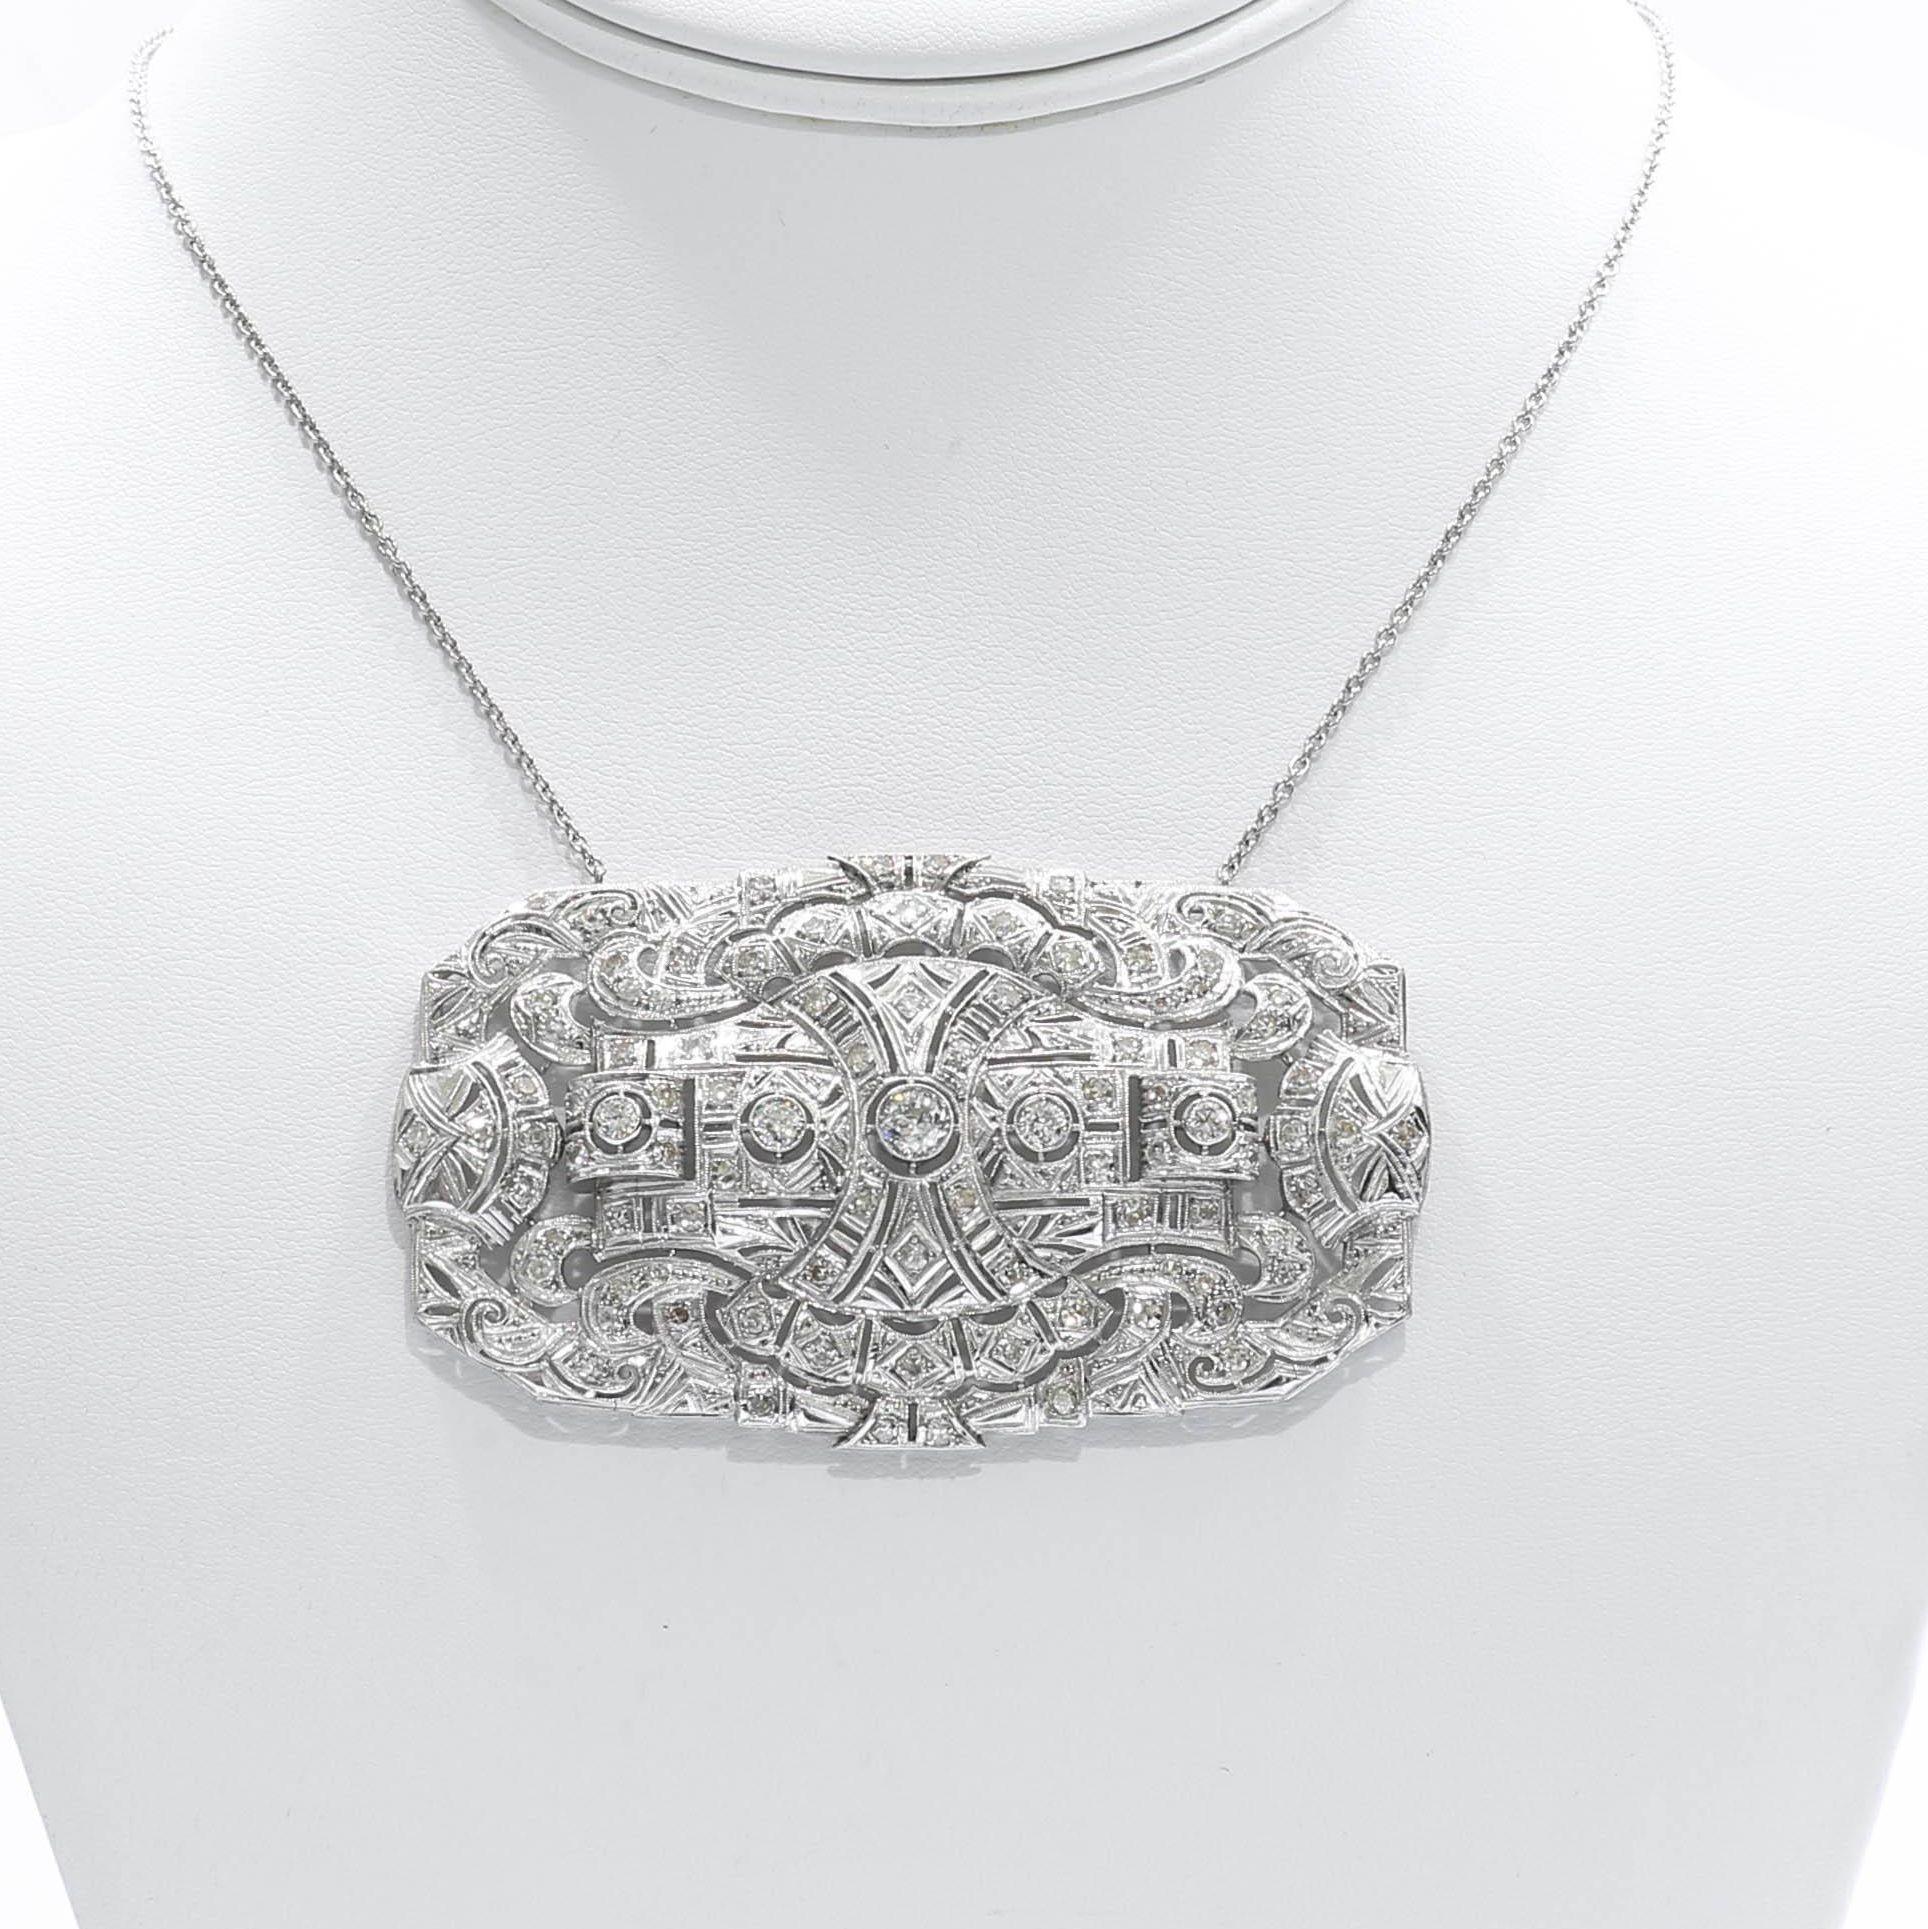 Monumental Size Edwardian Platinum Diamond Brooch